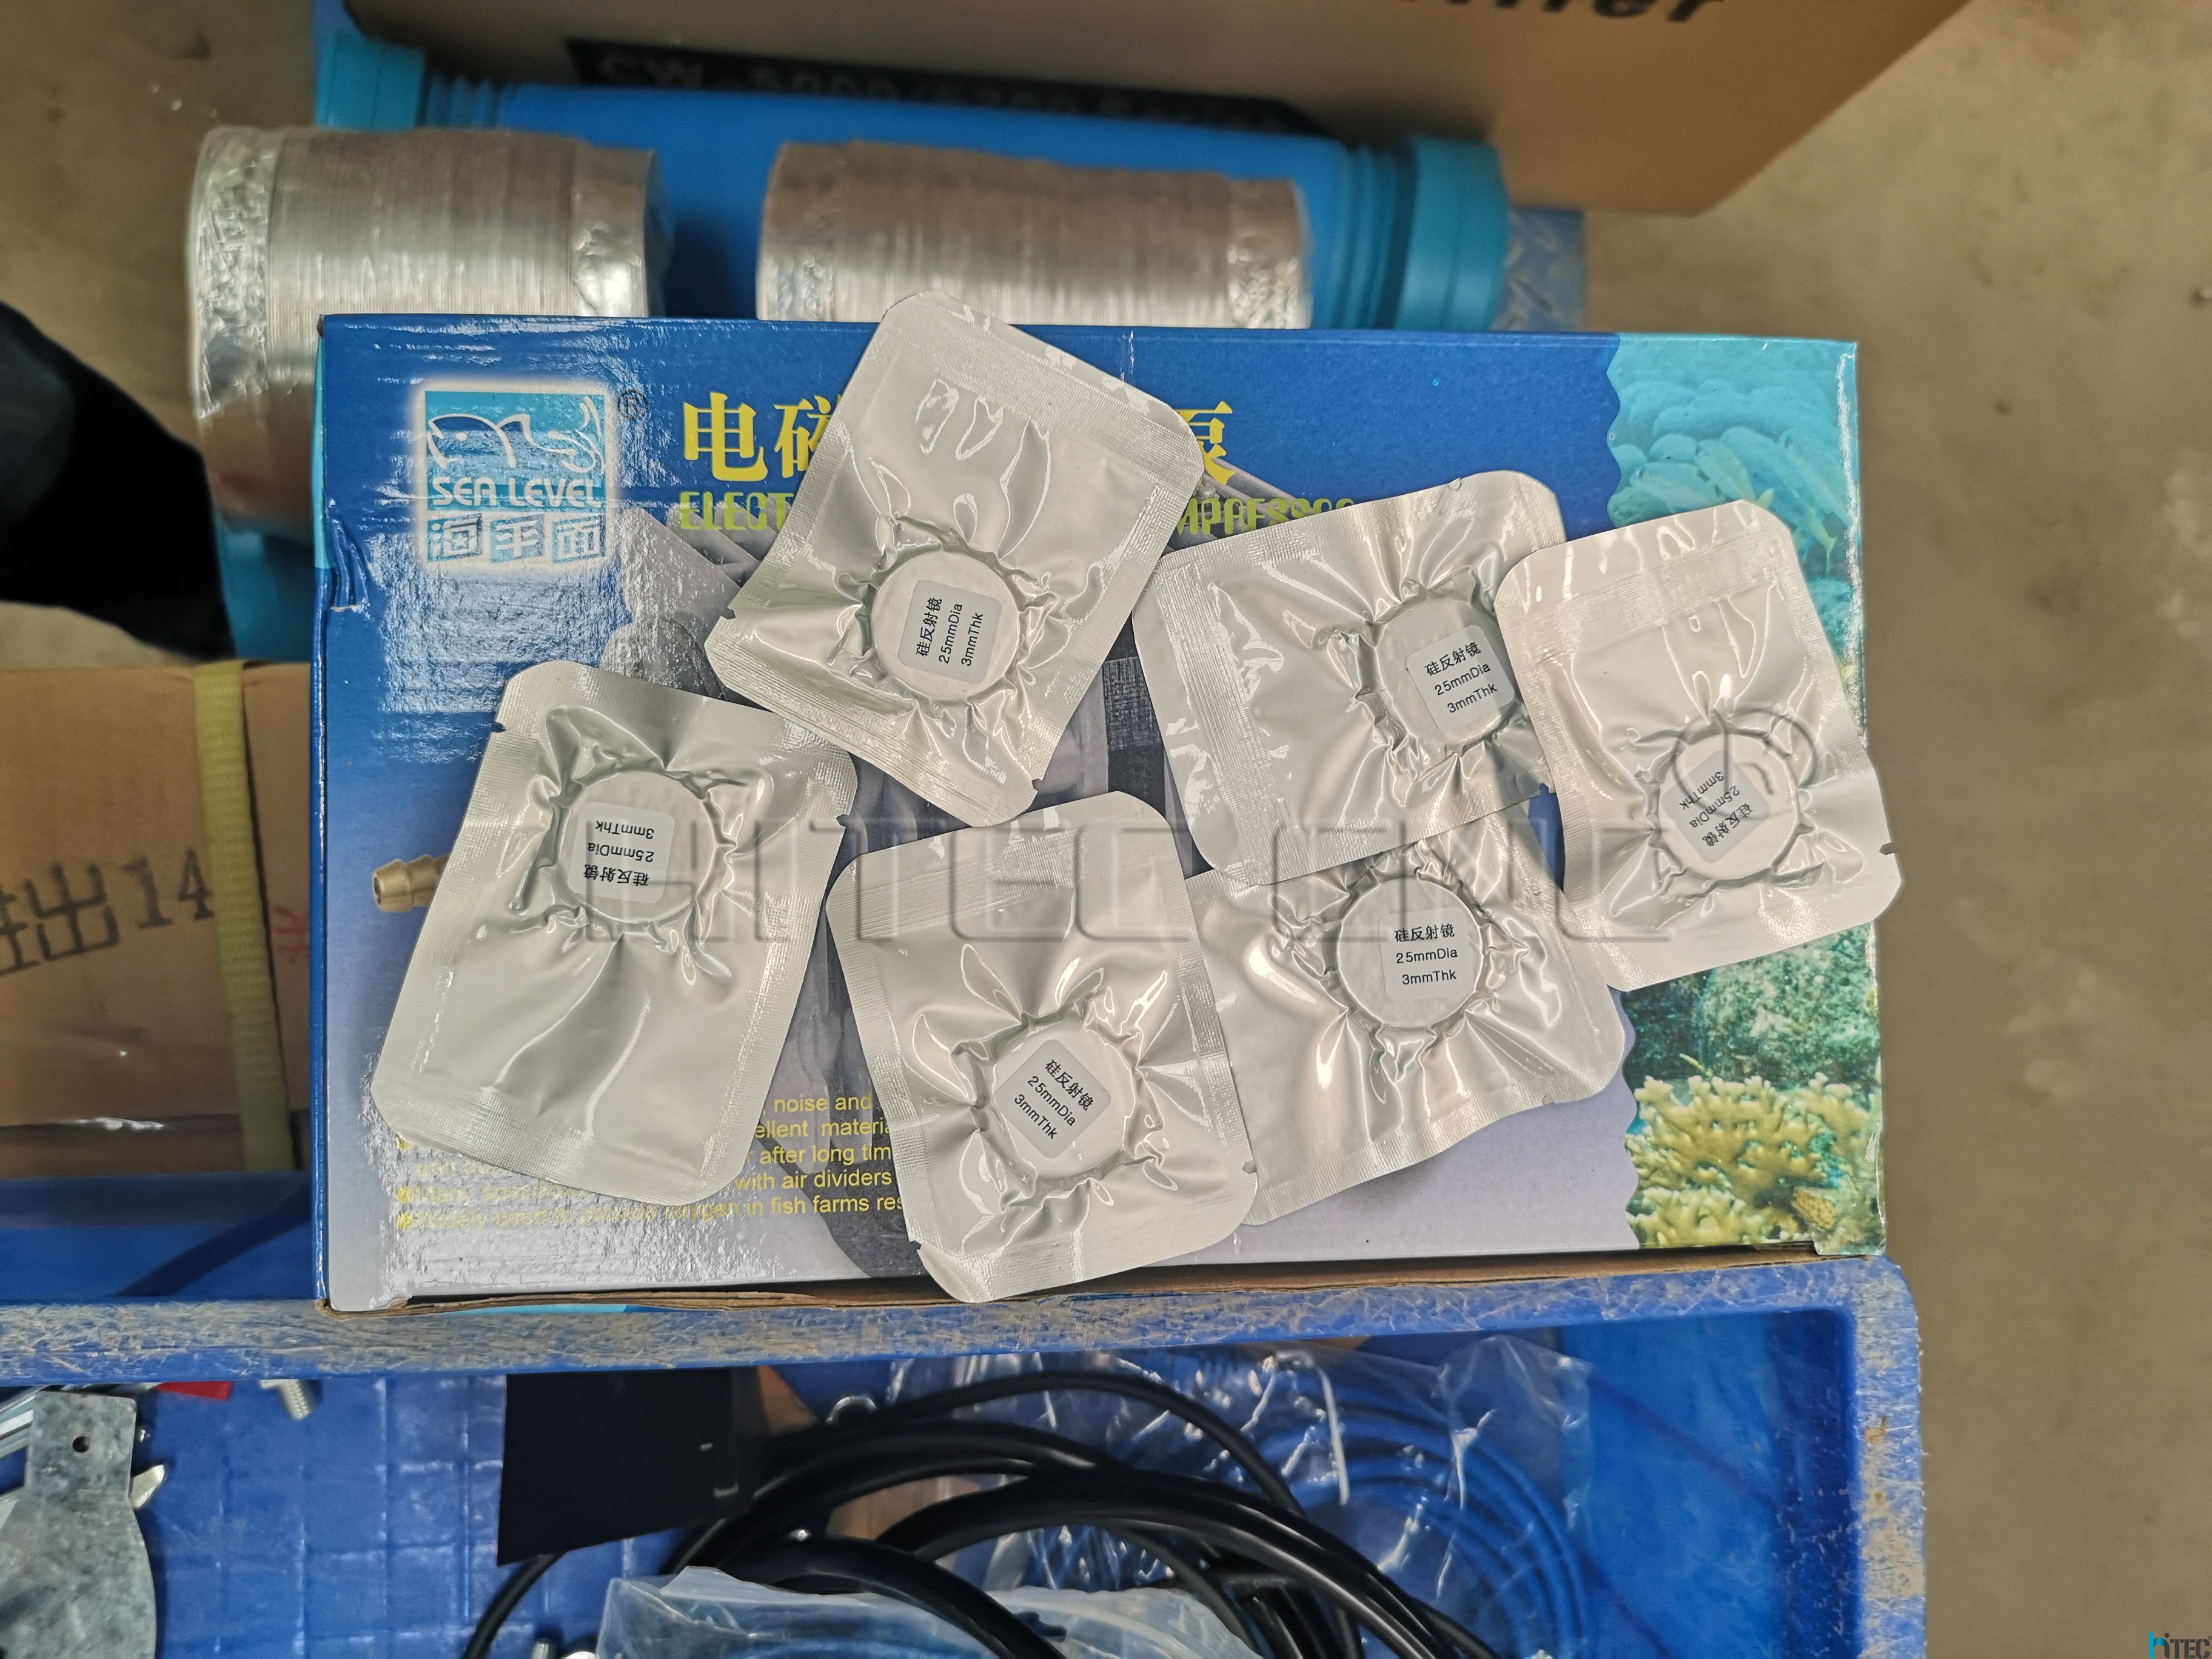 1325 Laser engraving cutting machine/ test video of acrylic cutting/ packing detail